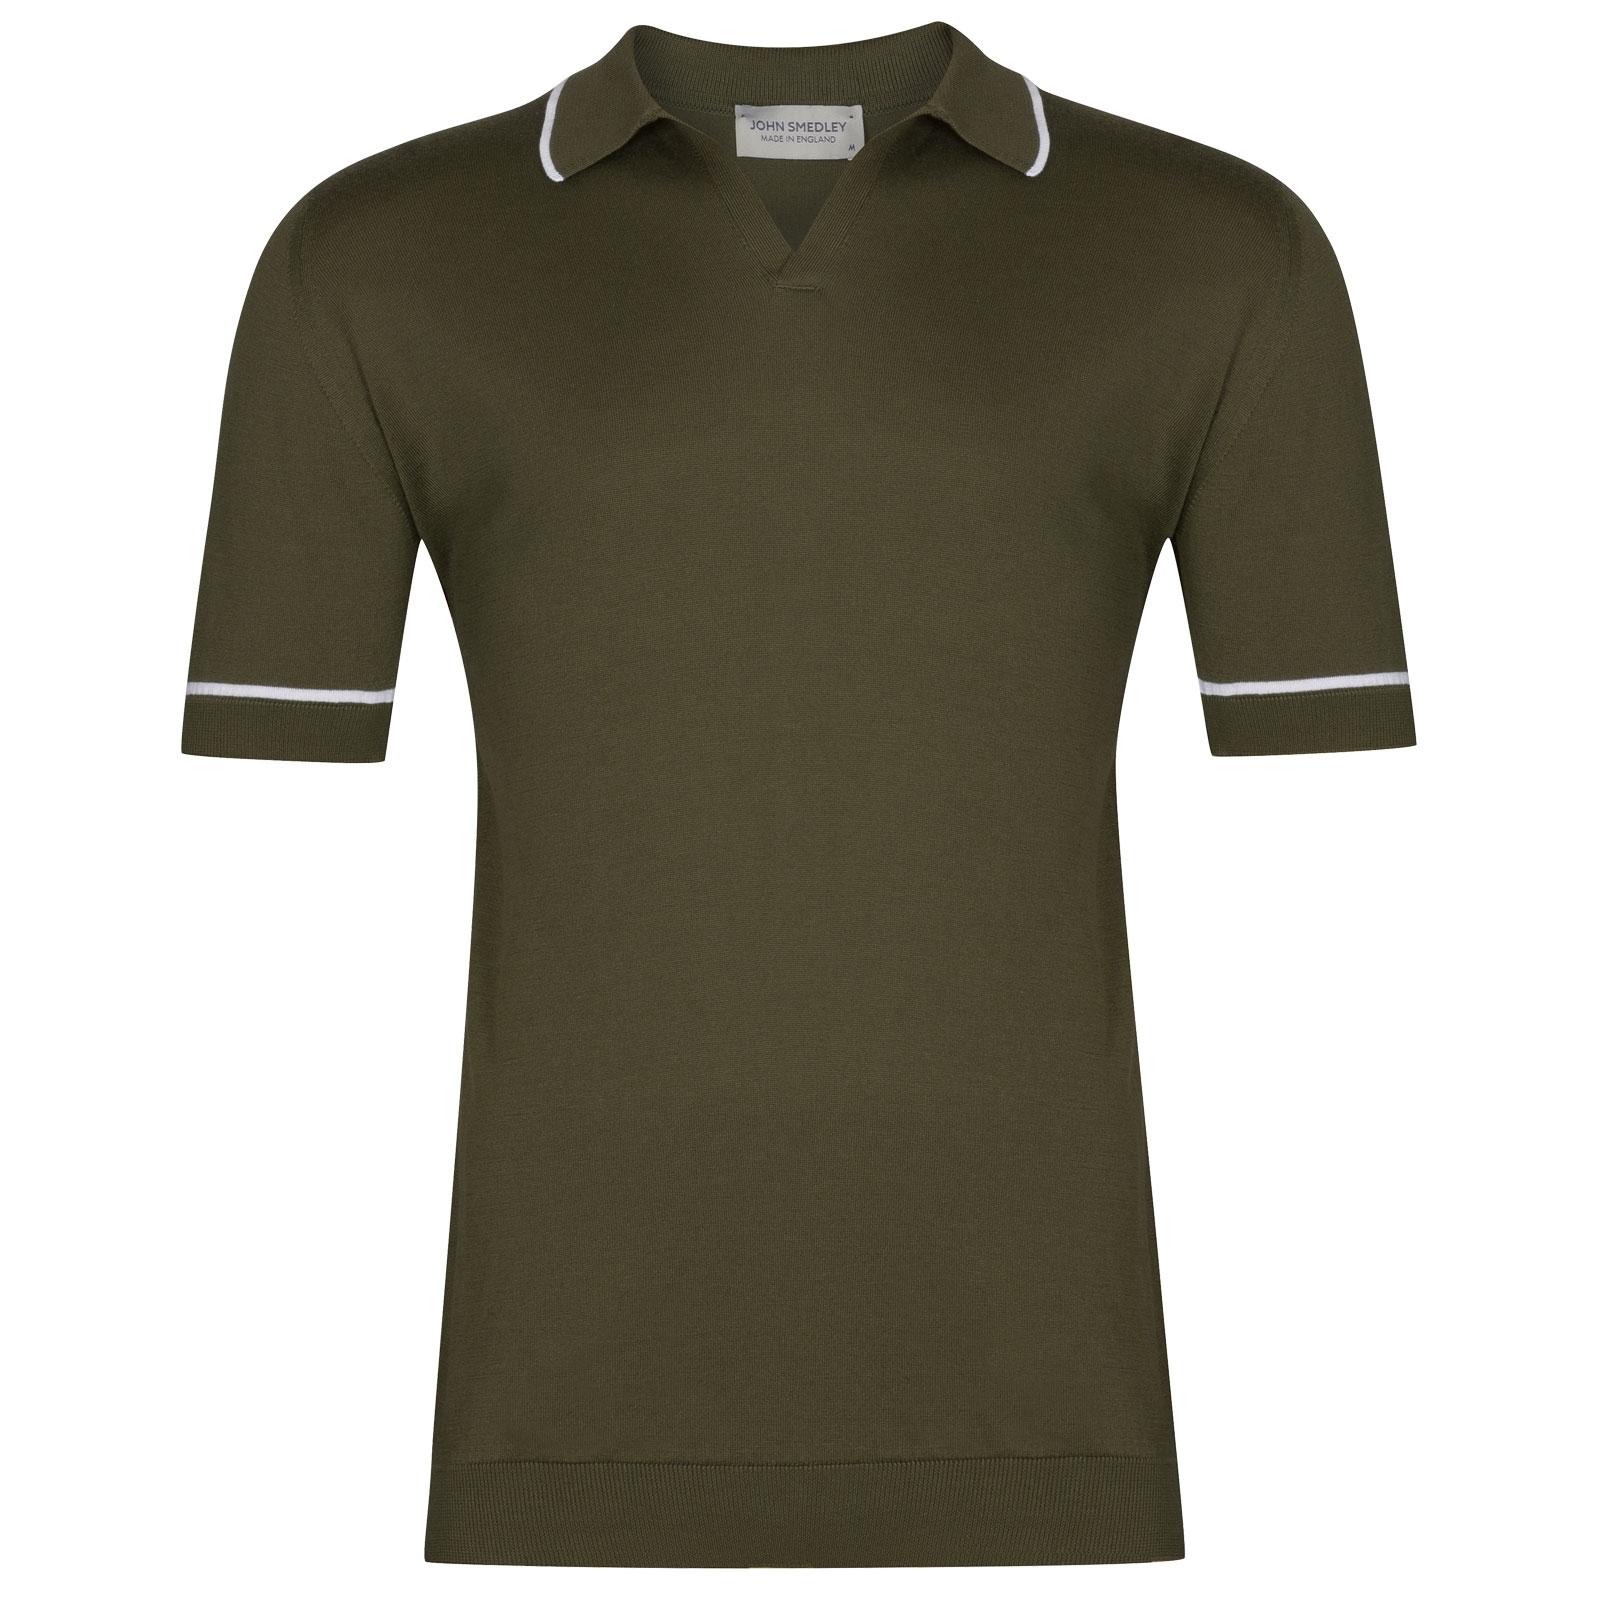 John Smedley Saxon in Sepal Green Shirt-XLG